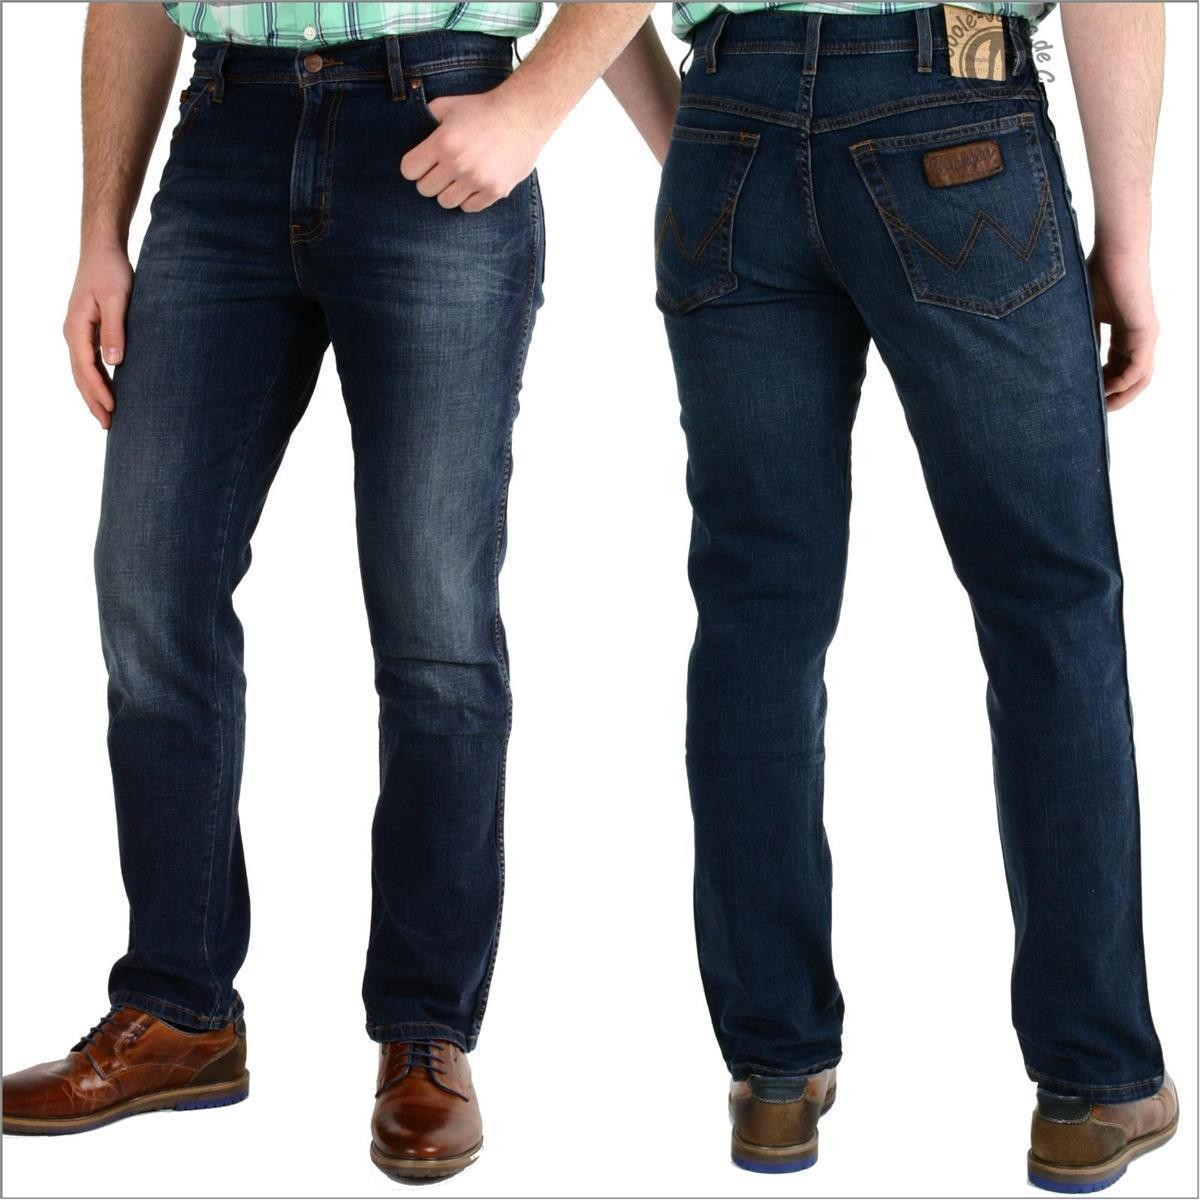 f9e8b20c7cef Wrangler, Wrangler Jeans, Wrangler-Jeans-Texas, Stretch Vintage-Tint ...